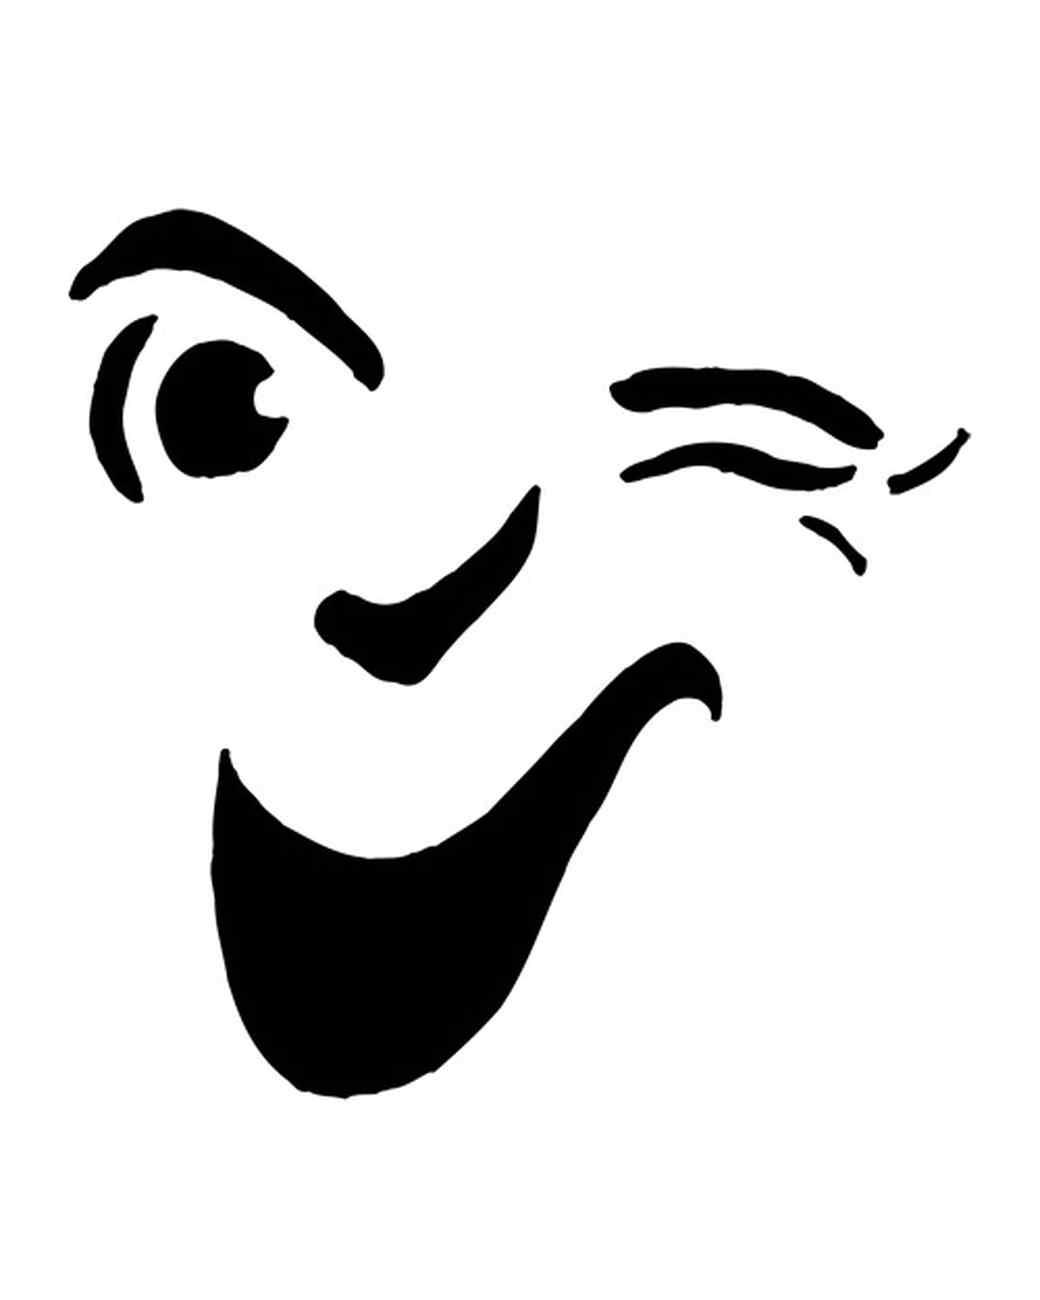 1004_pumpface_topleft_p5.jpg